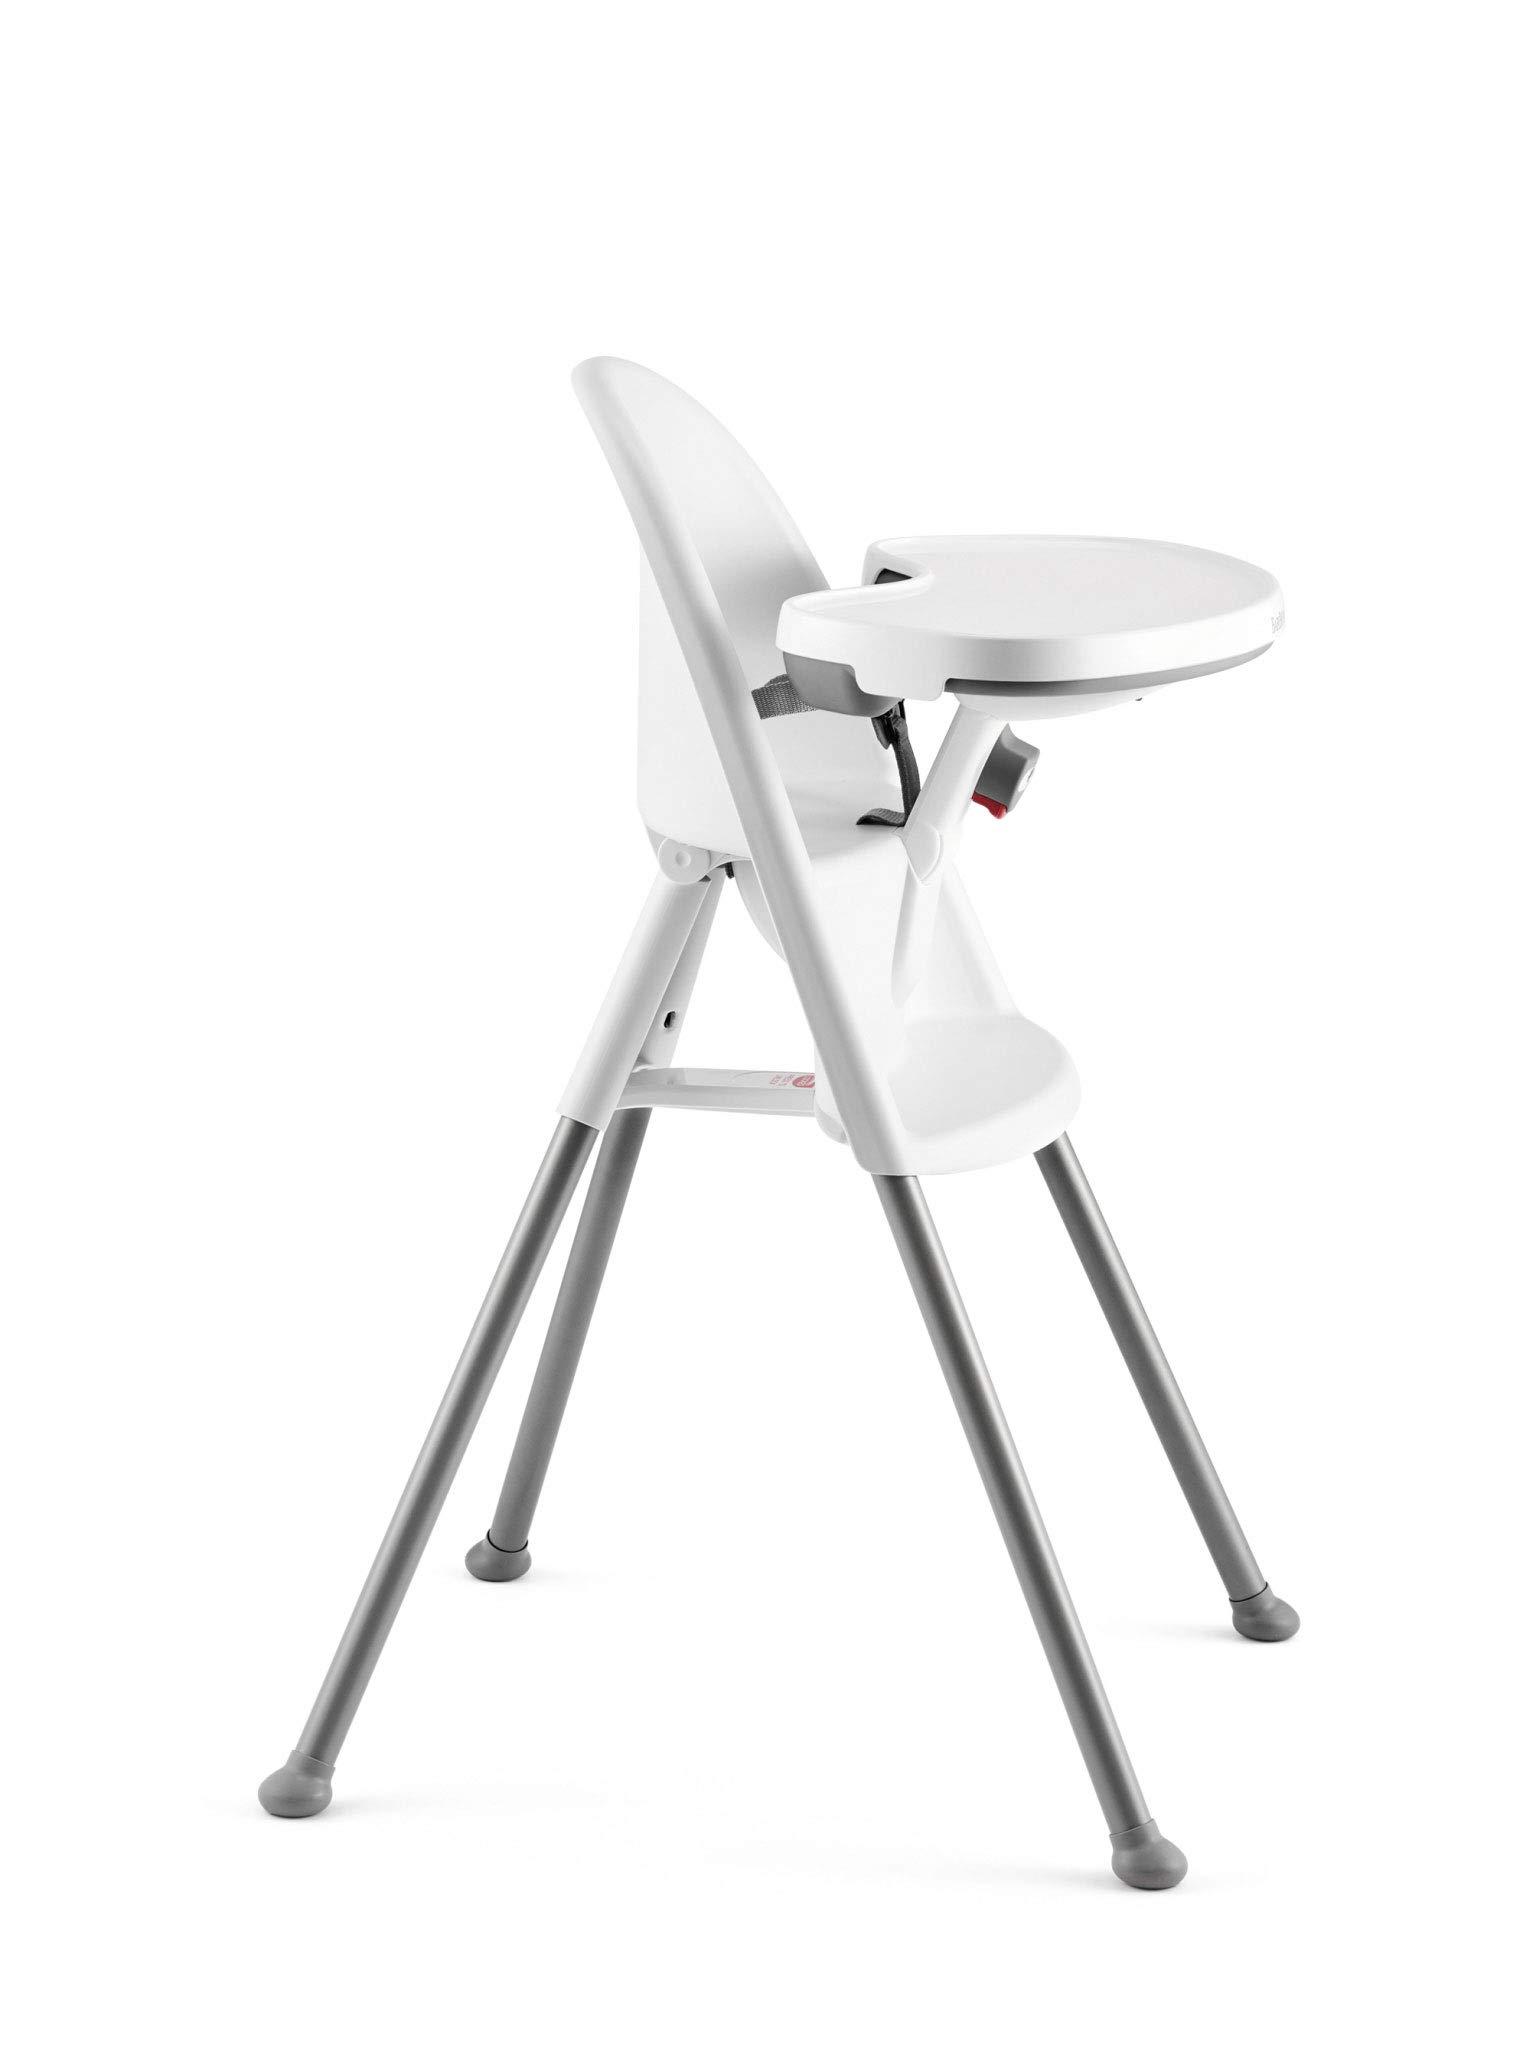 BabyBjörn 067221US High Chair, White/Gray by BabyBjörn